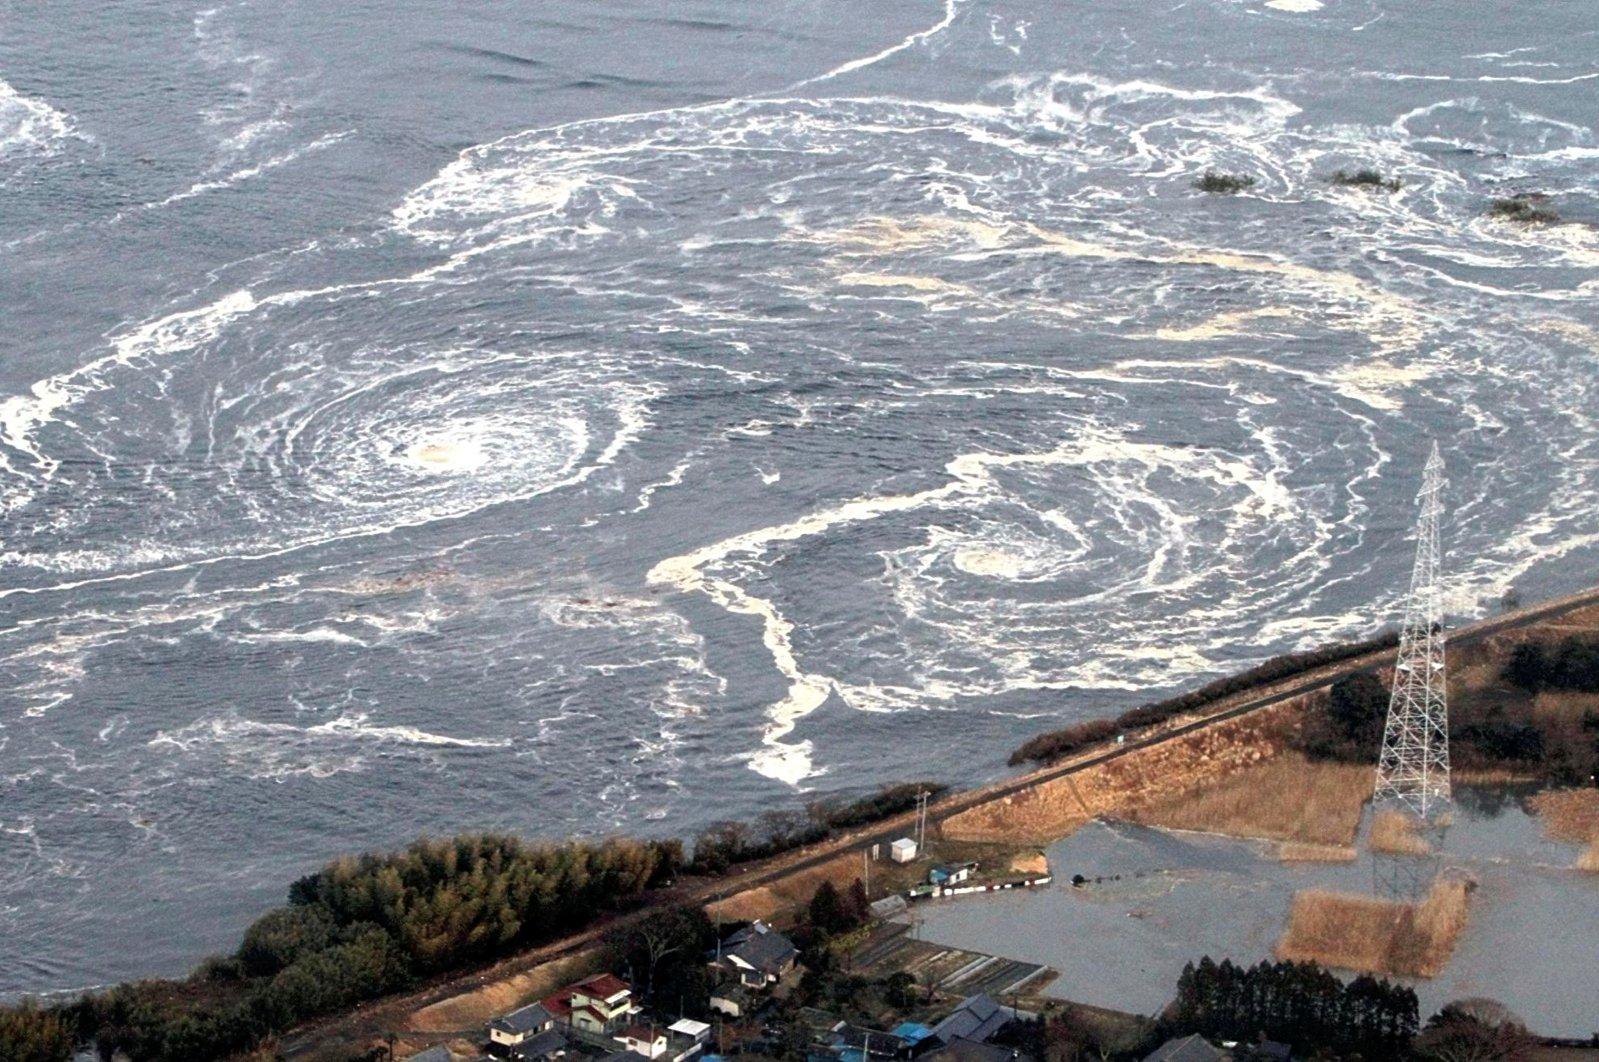 Whirlpools are seen following a tsunami and earthquake in Iwaki, Fukushima Prefecture, Japan, March 11, 2011. (Reuters File Photo)